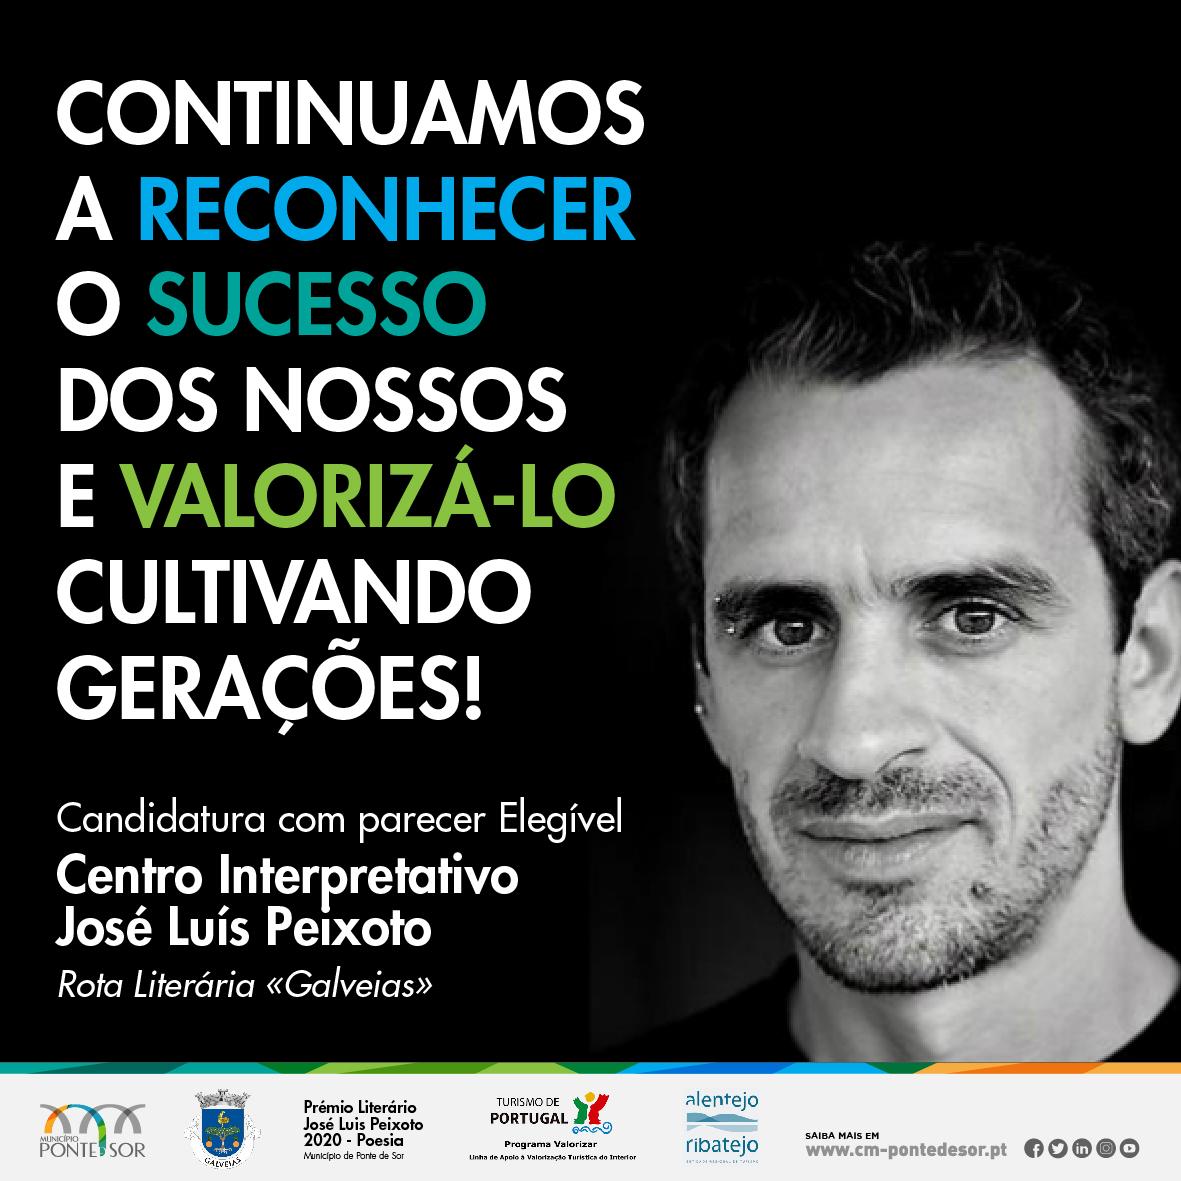 Centro Interpretativo José Luís Peixoto